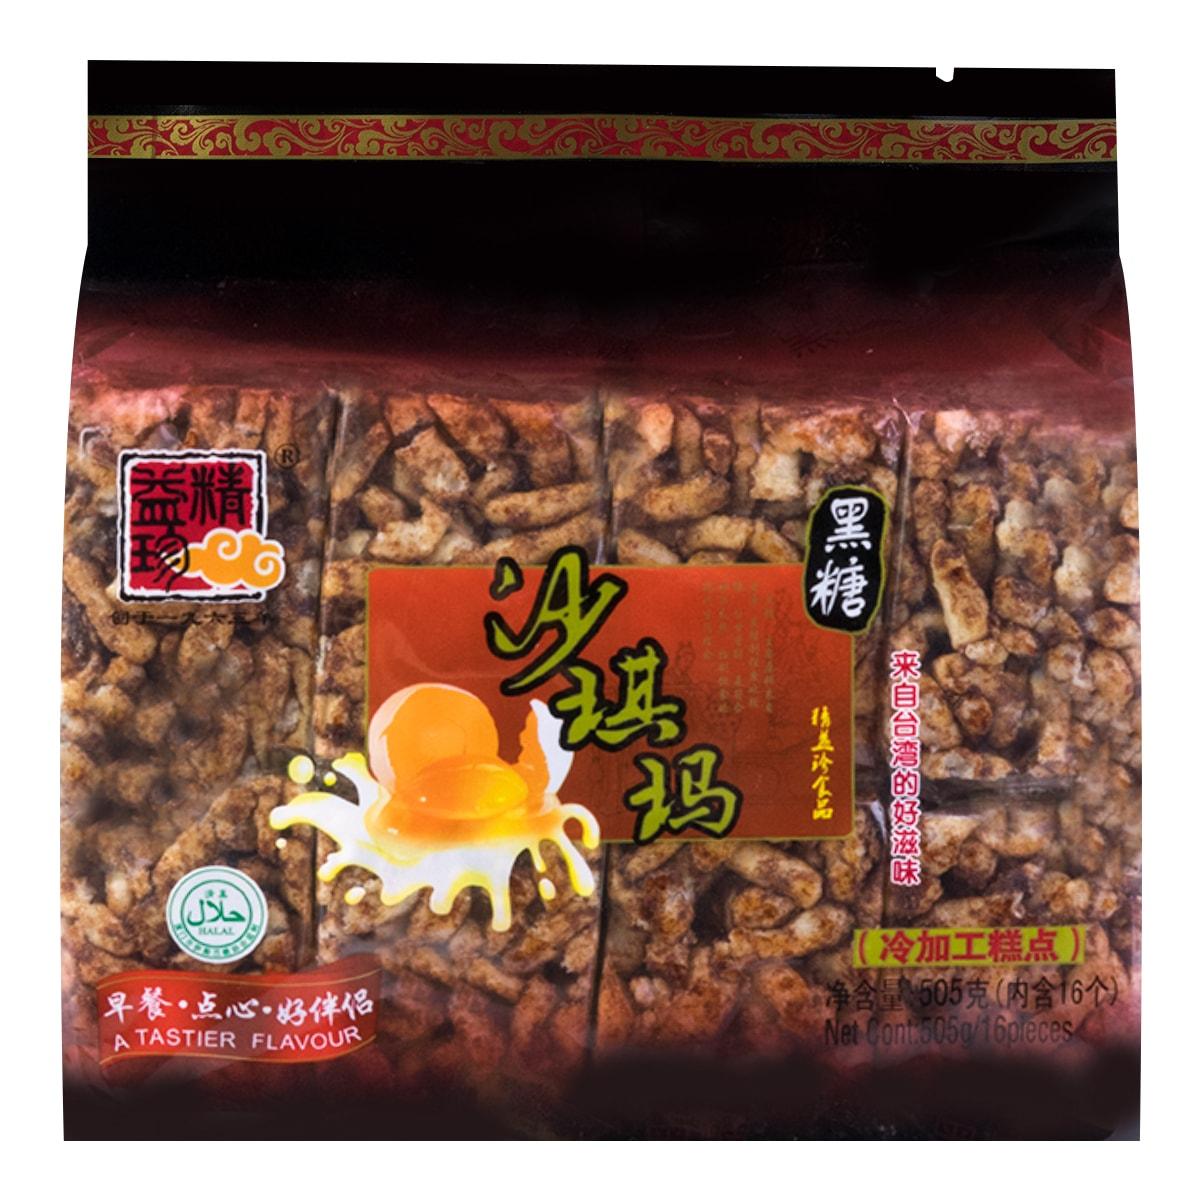 Yamibuy.com:Customer reviews:Brown Sugar Soft Flour Cake 505g